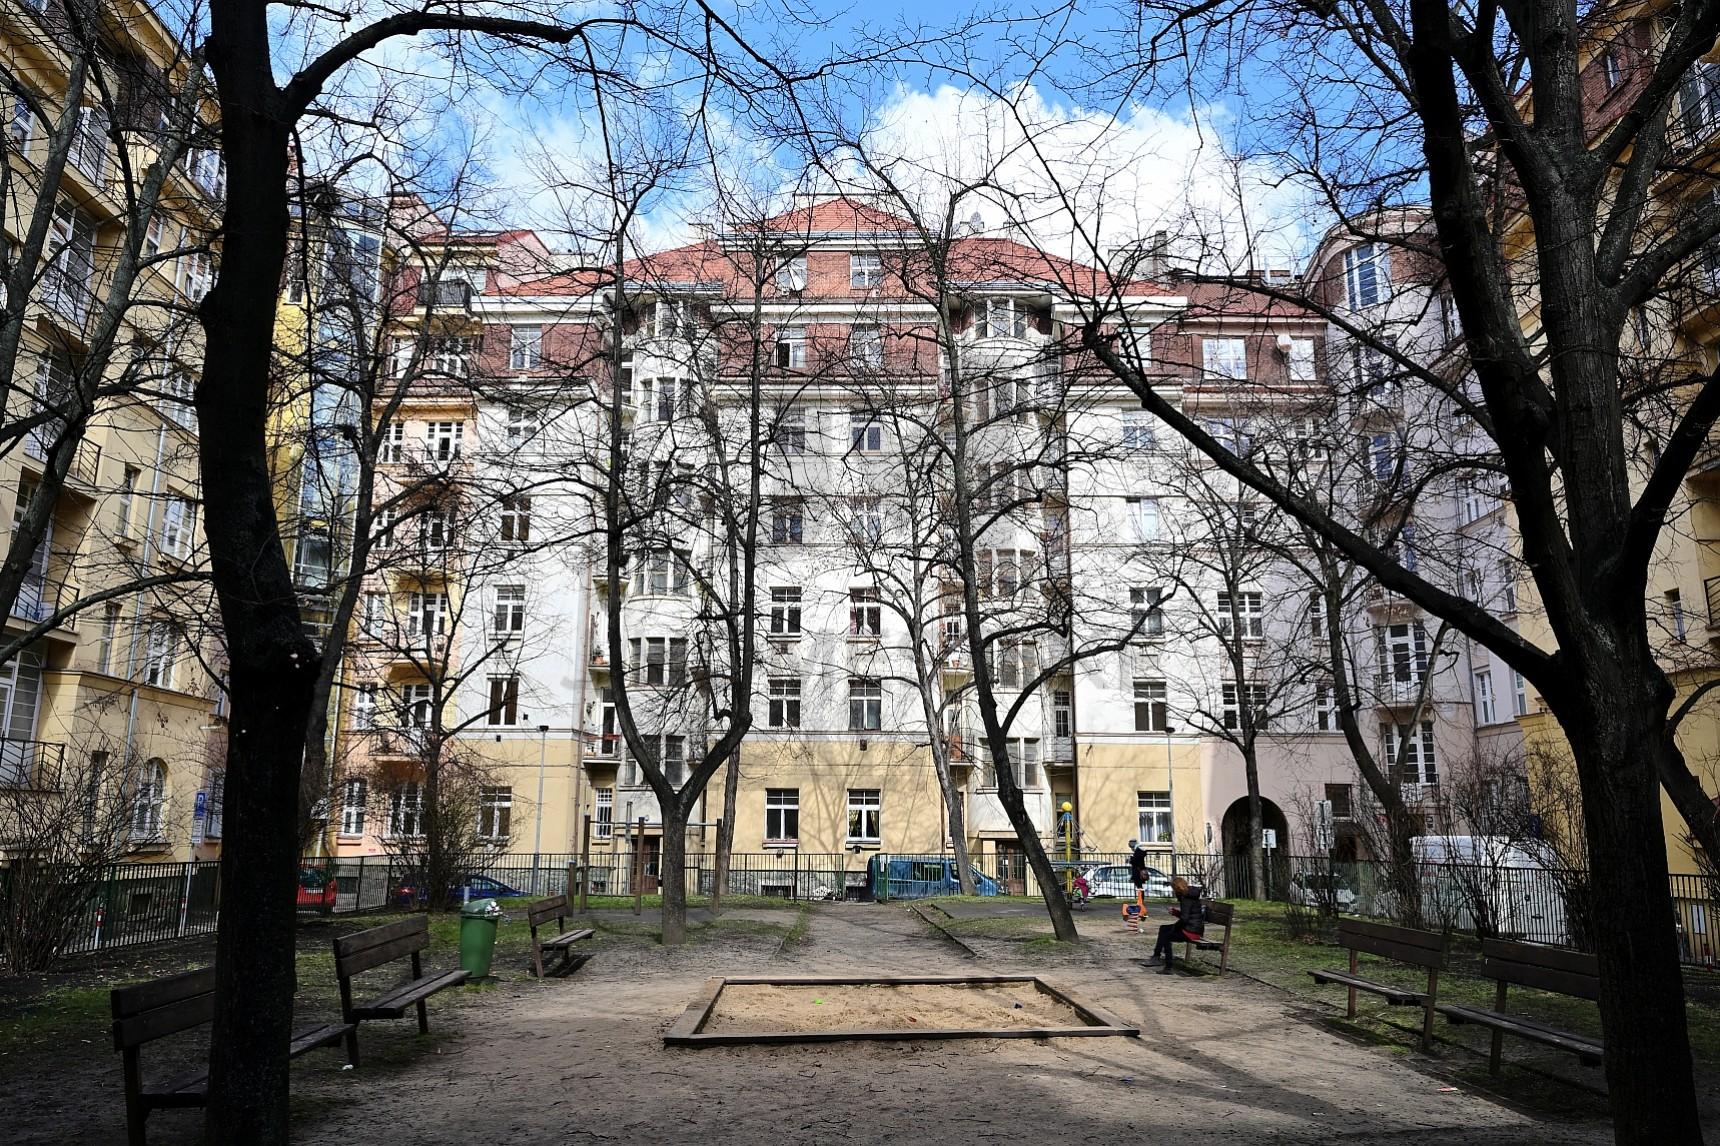 PRODEJ BYTU 2+kk S BALKONEM, Vinohradská, Praha 3 - Vinohrady